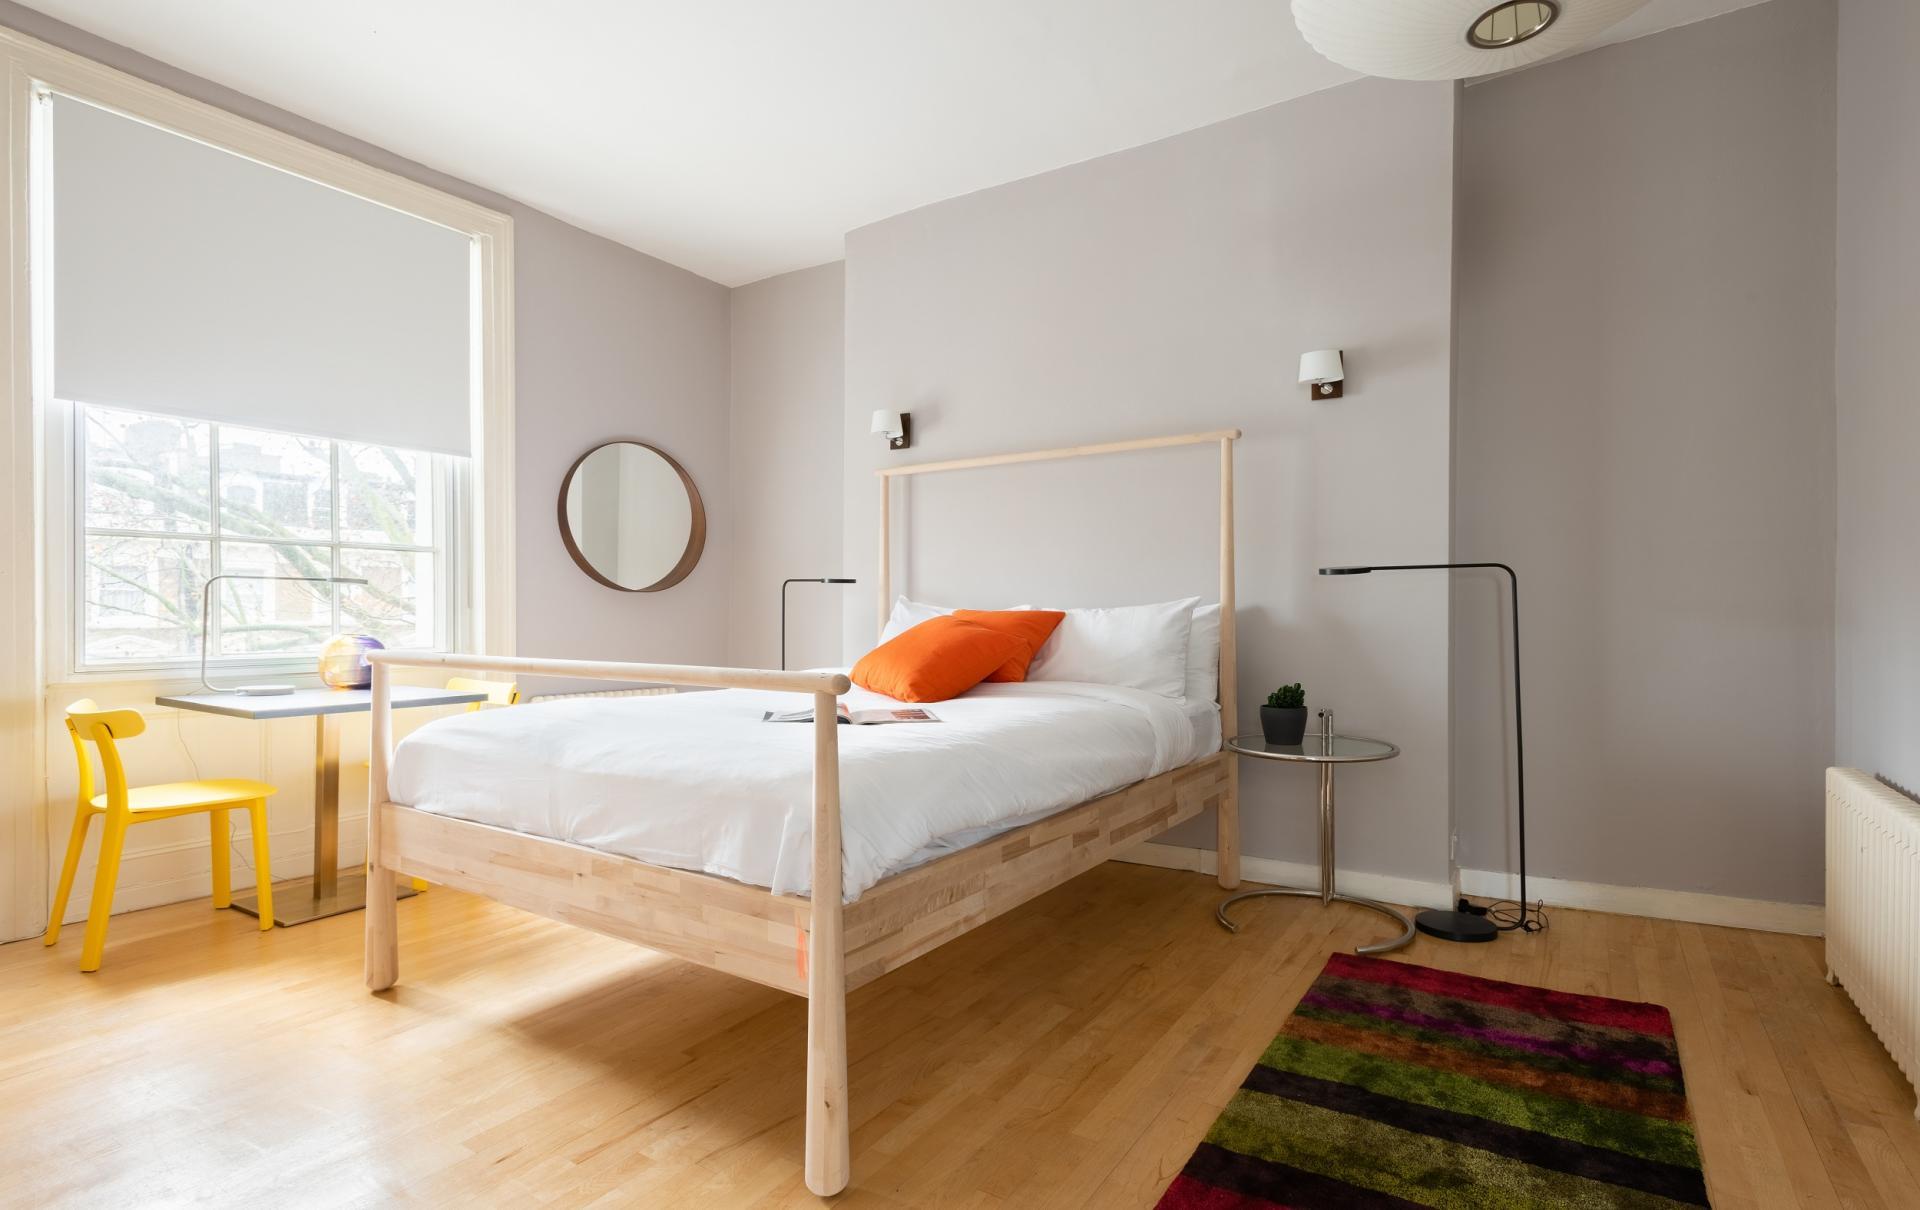 Bedroom at The Holland Park Escape, Holland Park, London